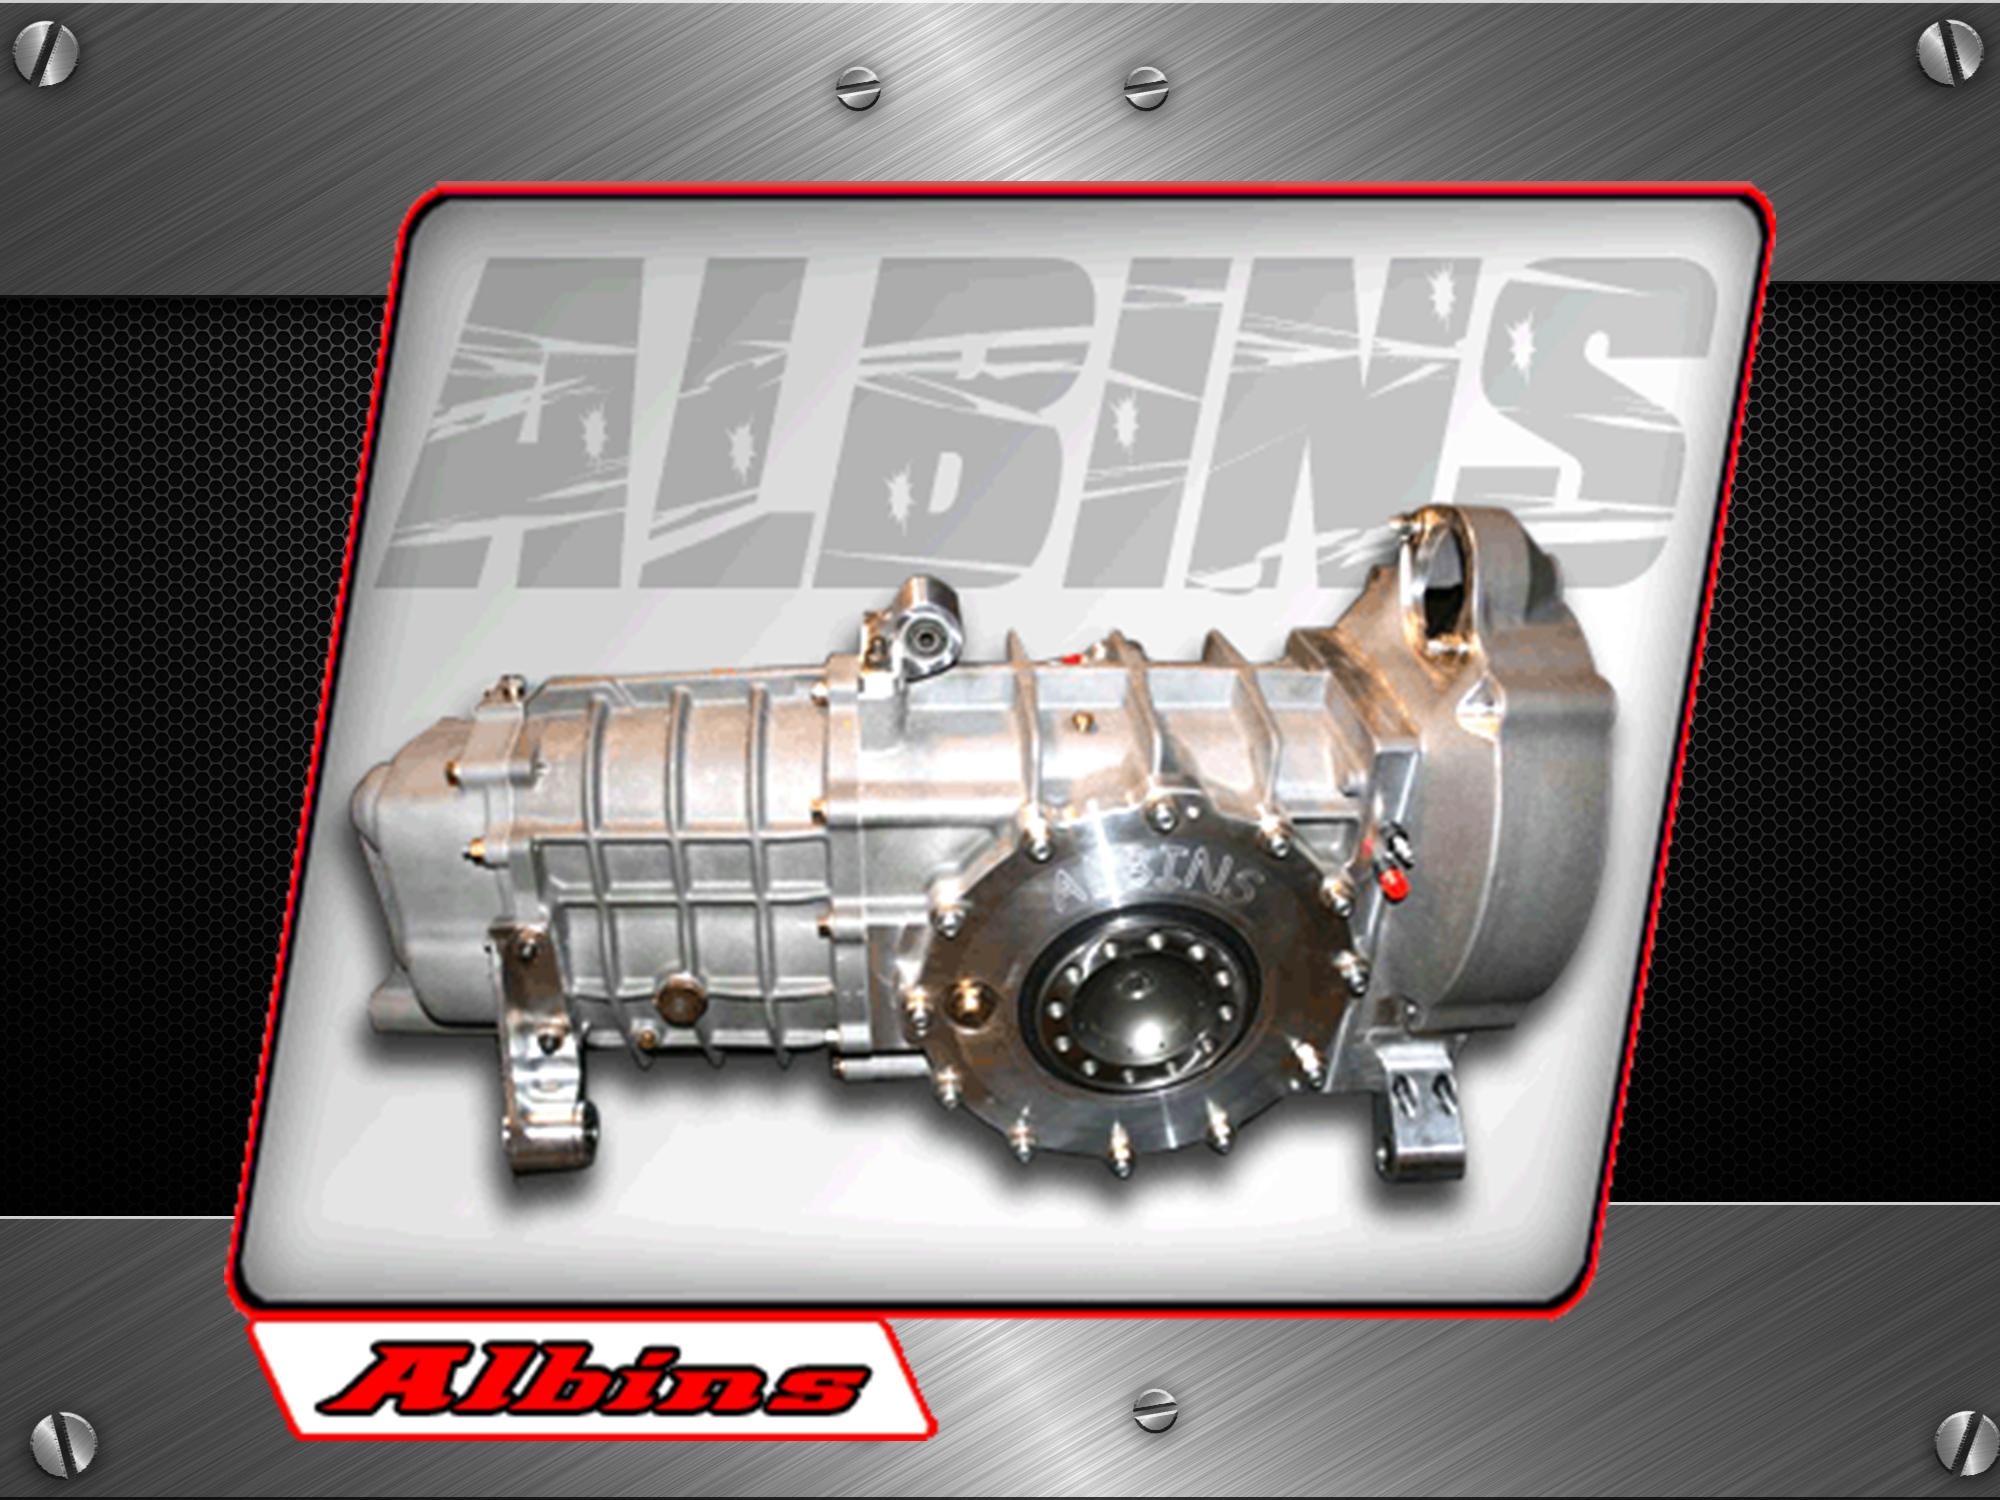 Albins transmissions wright gear box